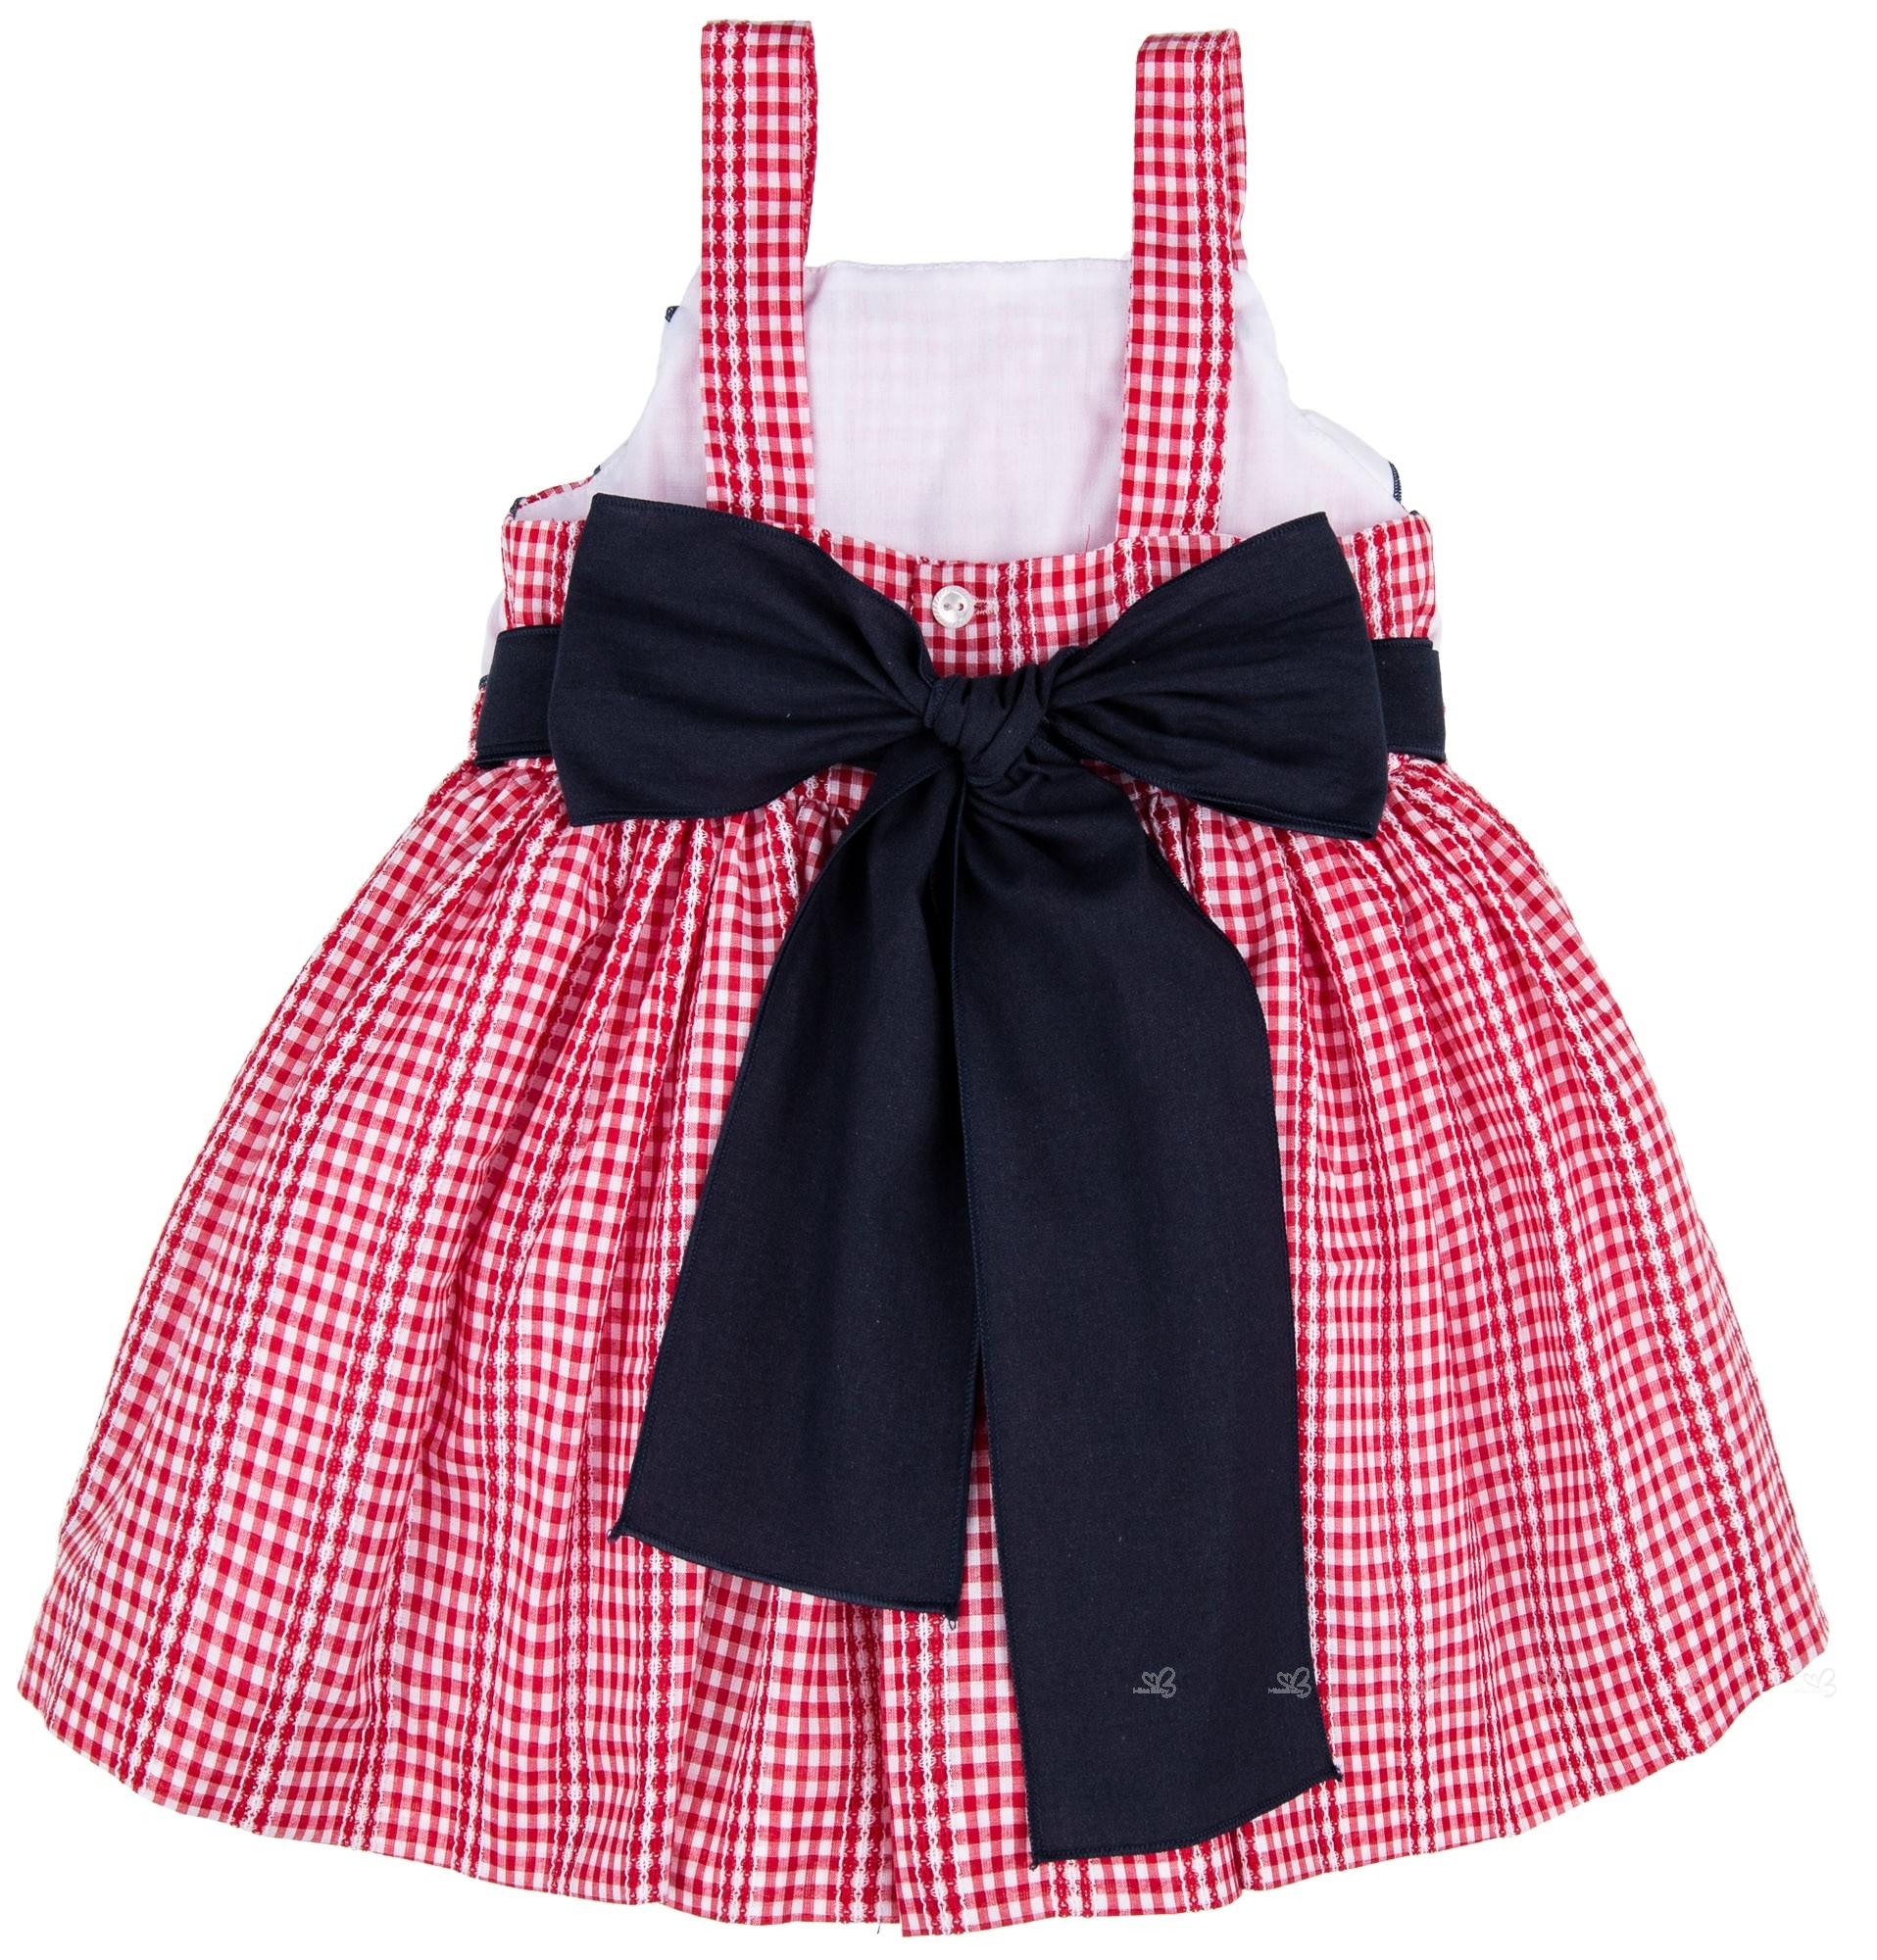 89050cf9501 Home  Girls Red Gingham Dress   White Ruffles. Lappepa Moda Infantil  Vestido Niña Vichy Rojo   Volantes Fruncidos en Blanco · Lappepa Moda  Infantil Vestido ...